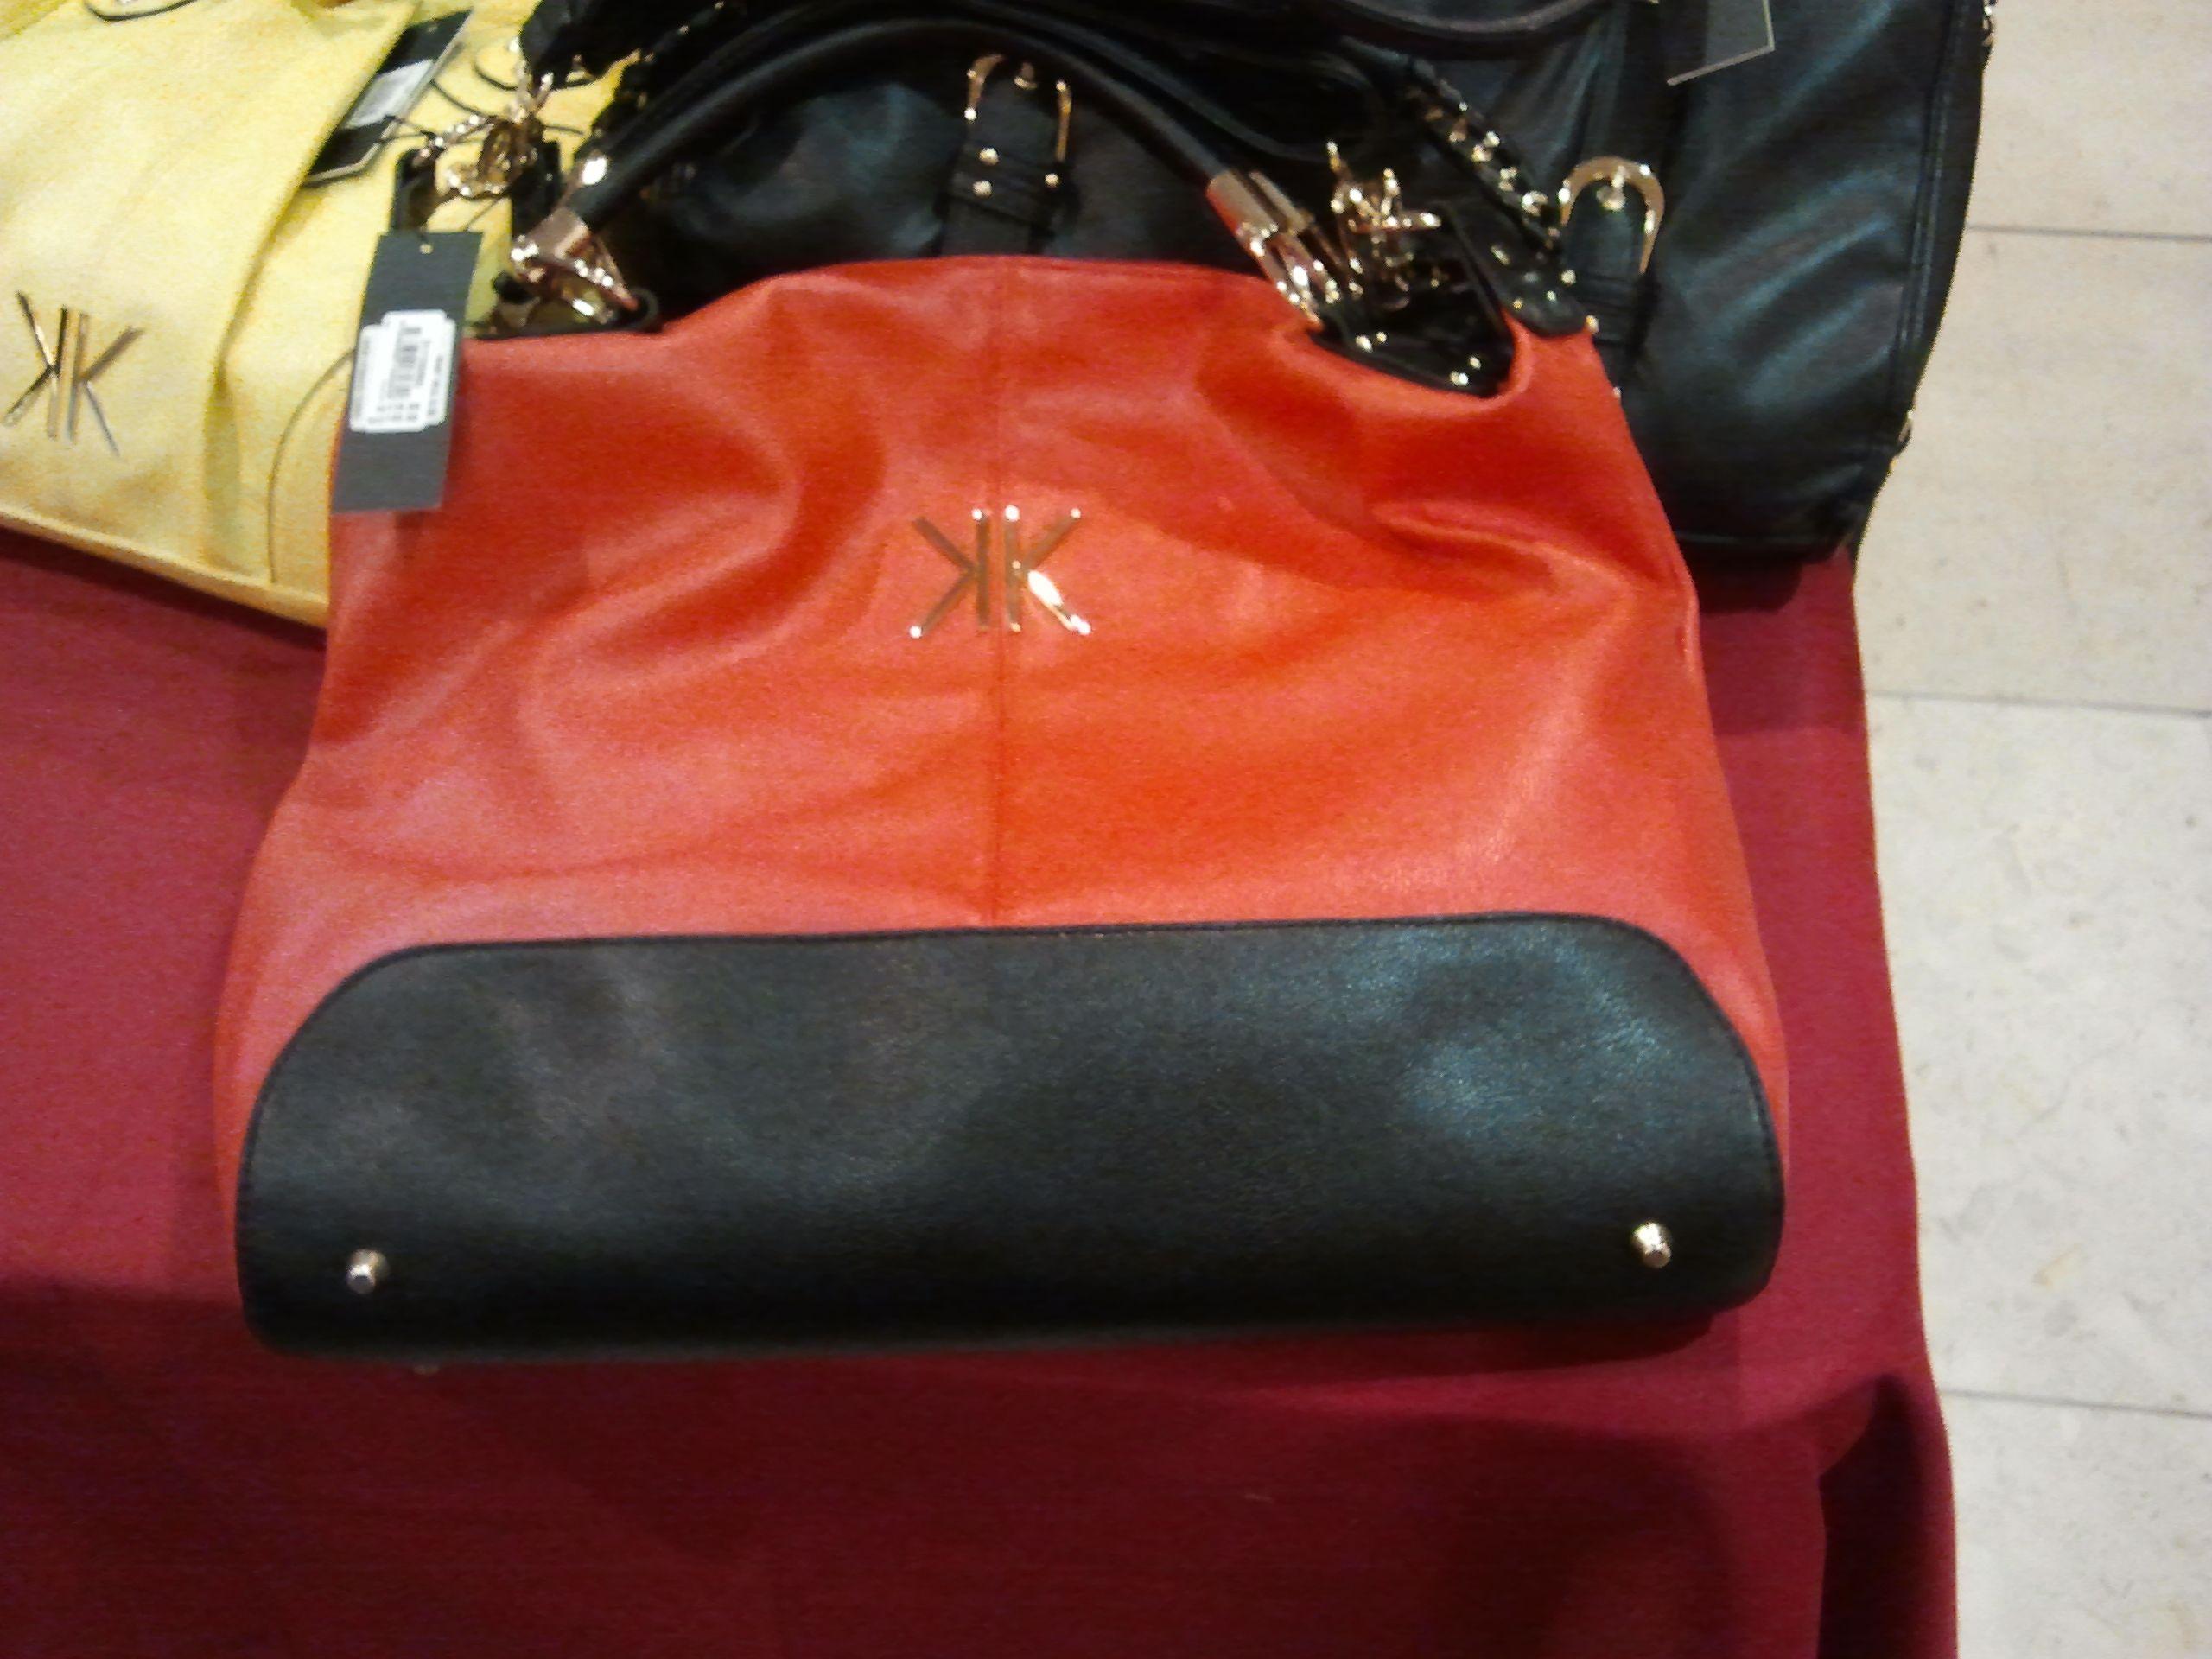 Kerry Strandbags Kk Handbag 119 00